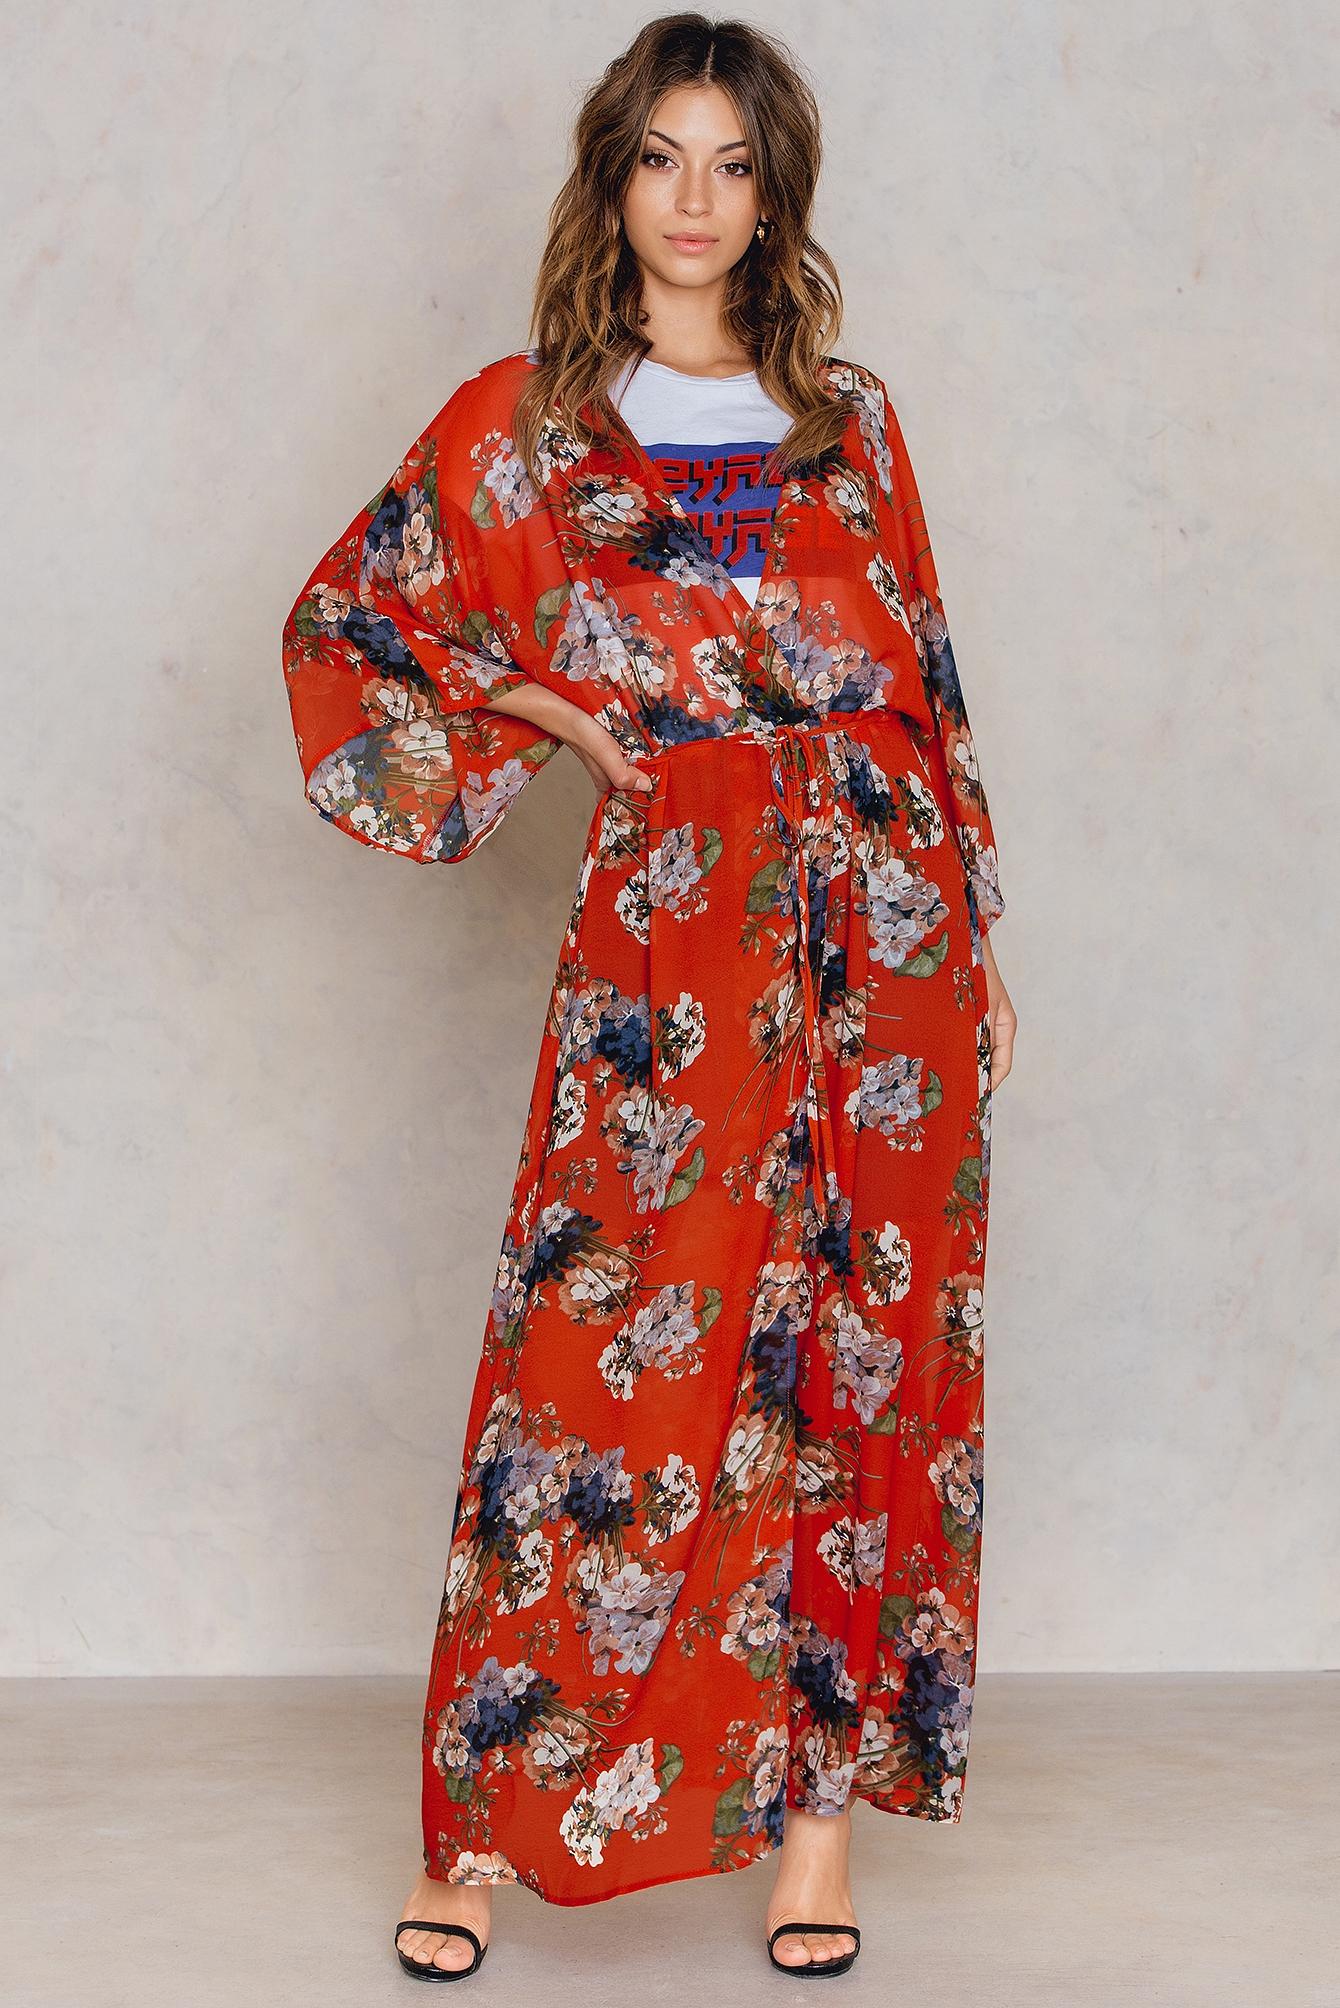 NA-KD Trend Chiffon Coat Dress Red, Multicolor